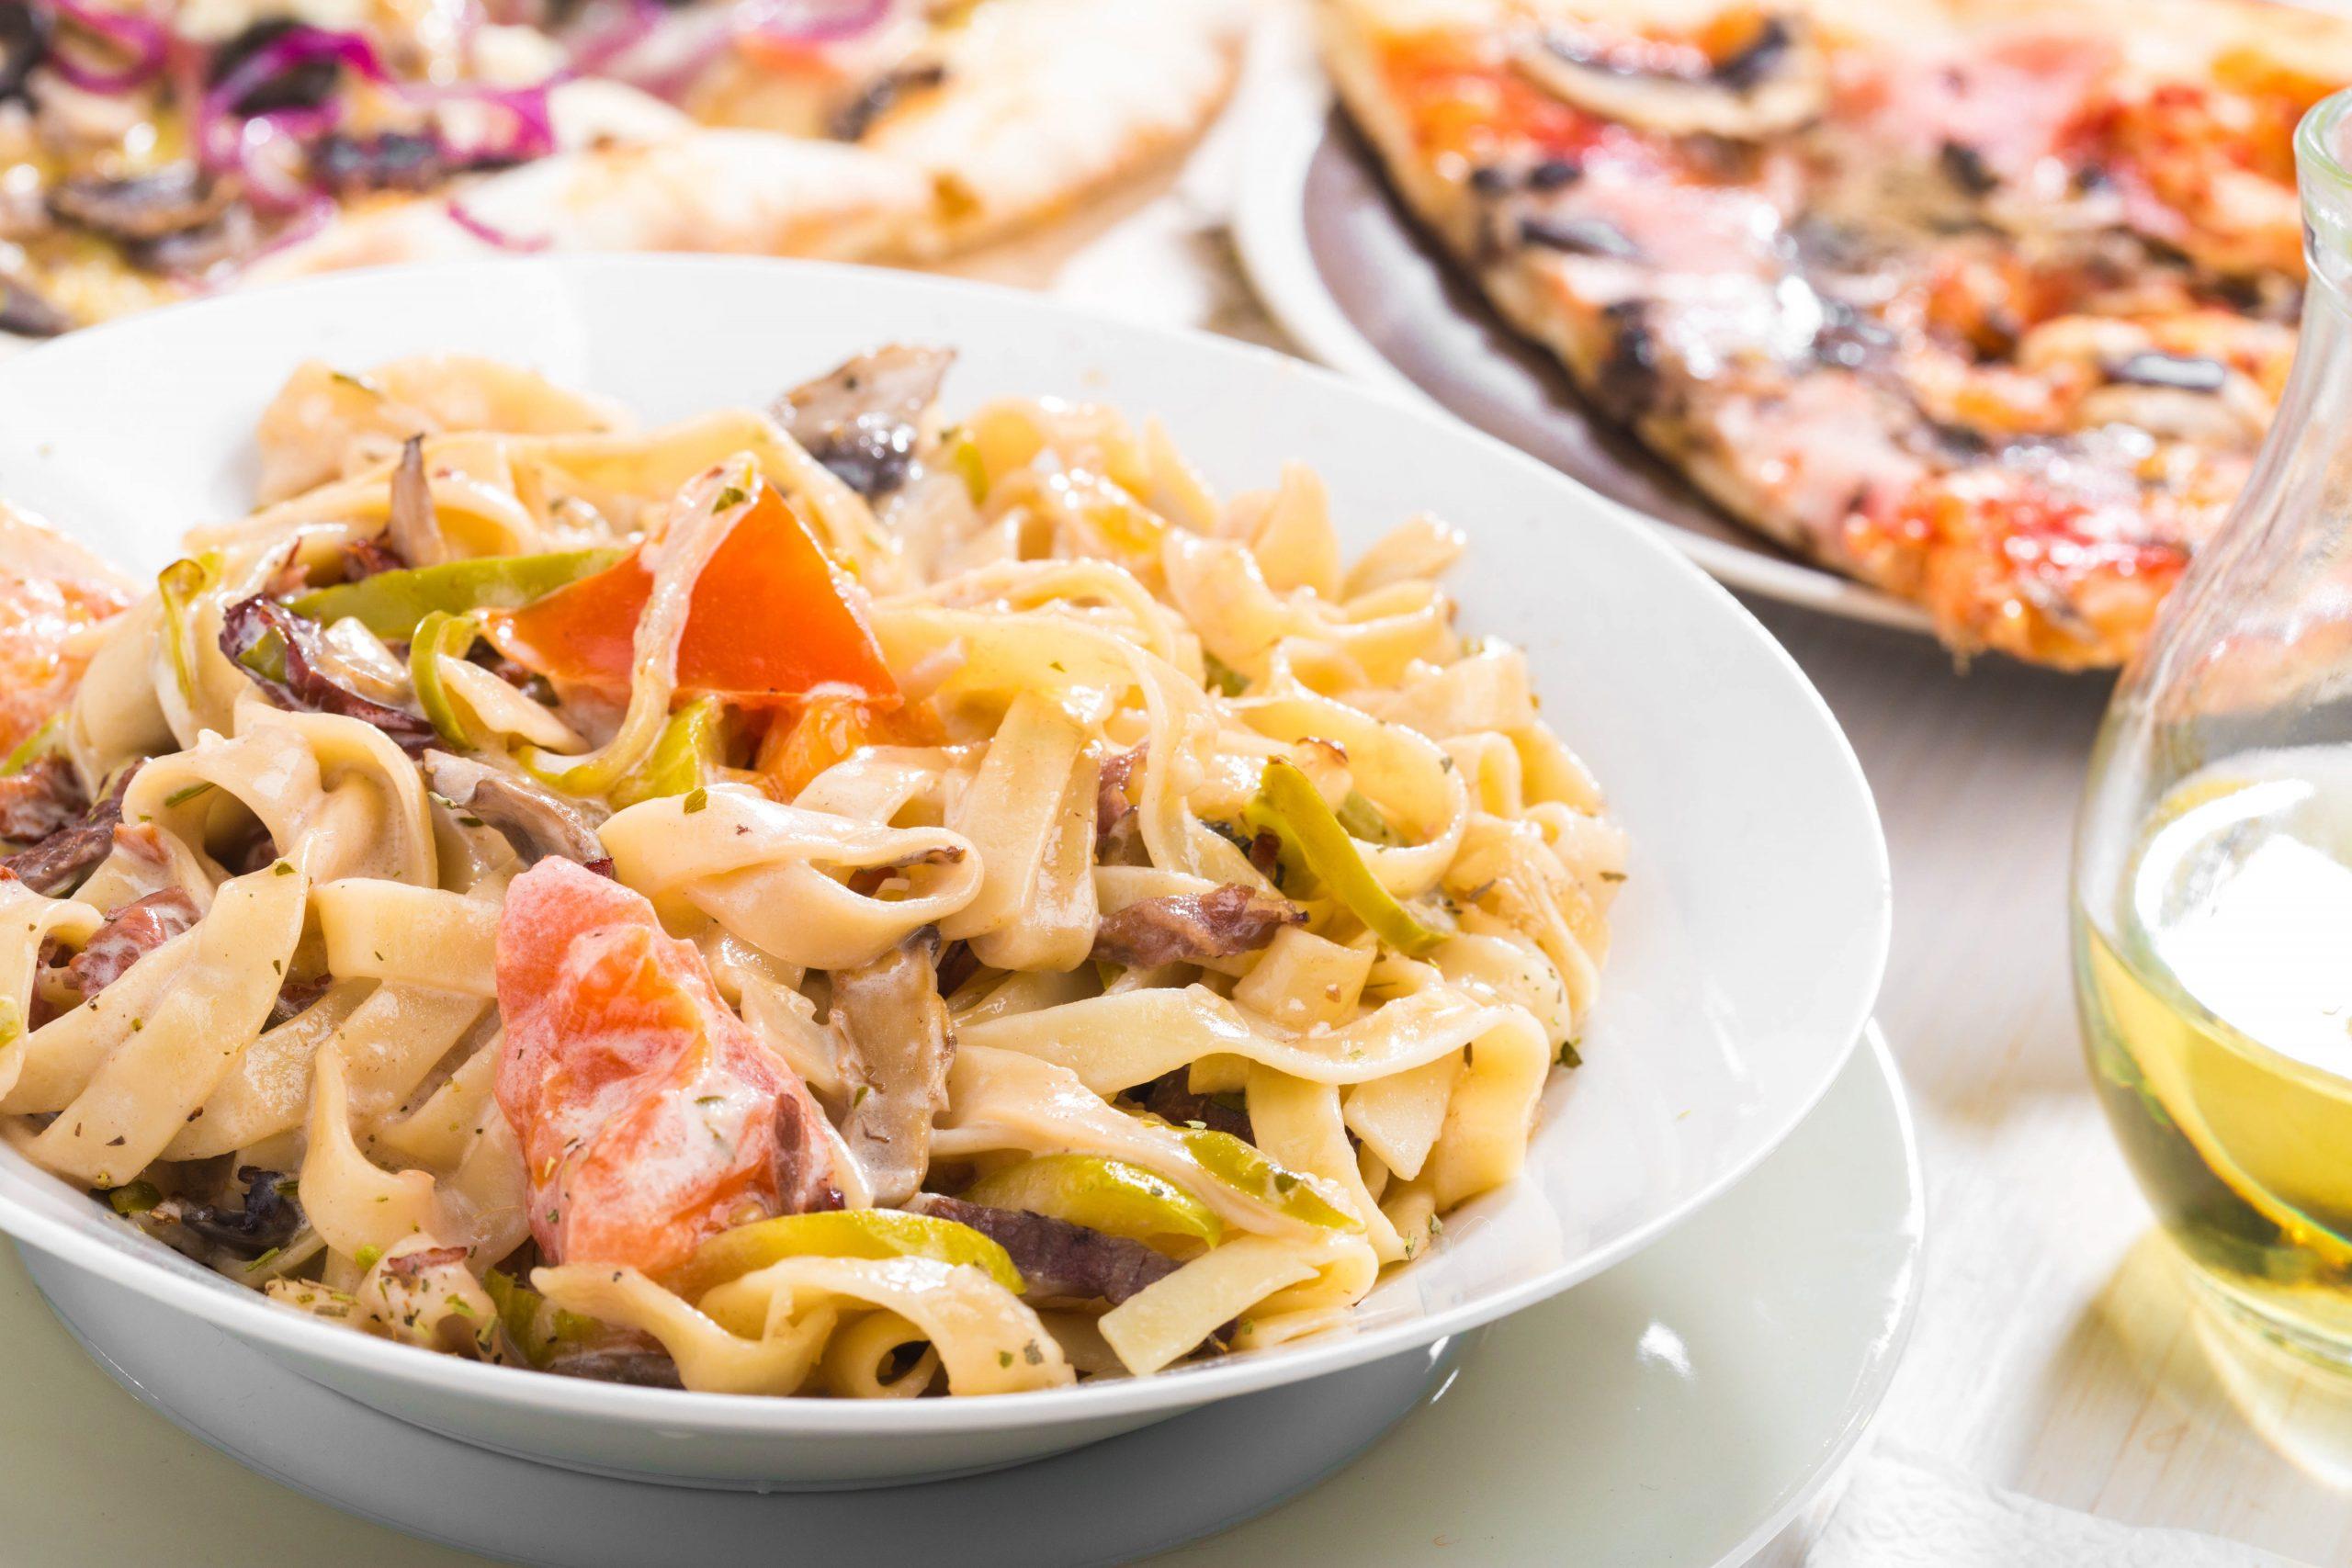 italian food pasta and pizza